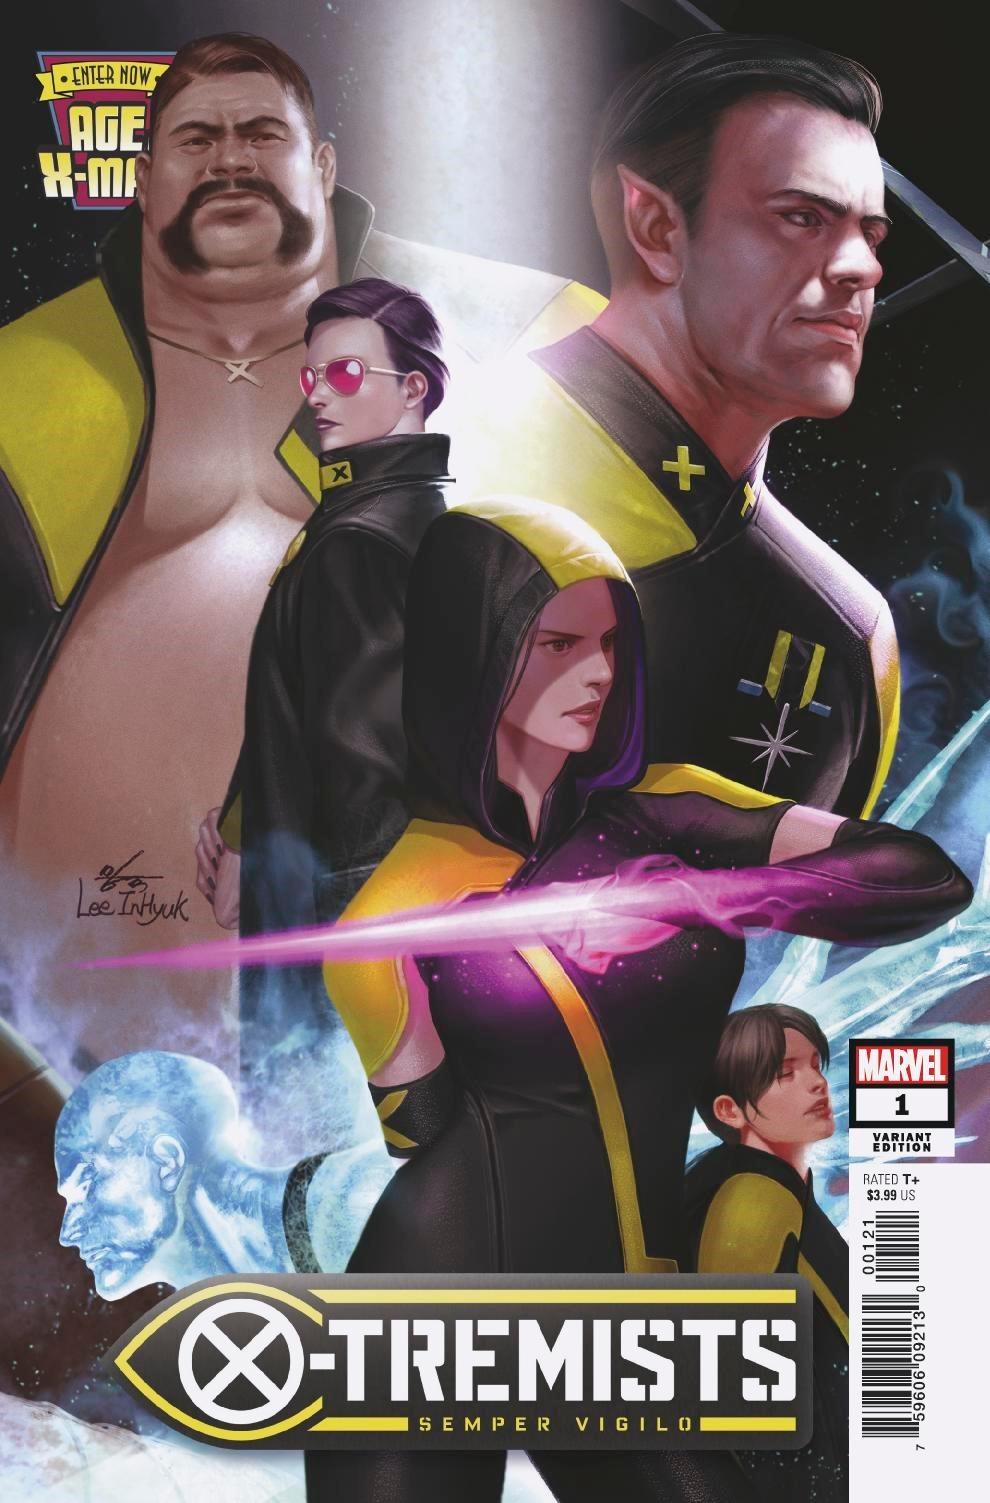 Age Of X Man X Tremists 1 X Men Marvel Comics Marvelcomics Psylocke Iceman Jubilee Mutants Ageofxman X Man Marvel X Men